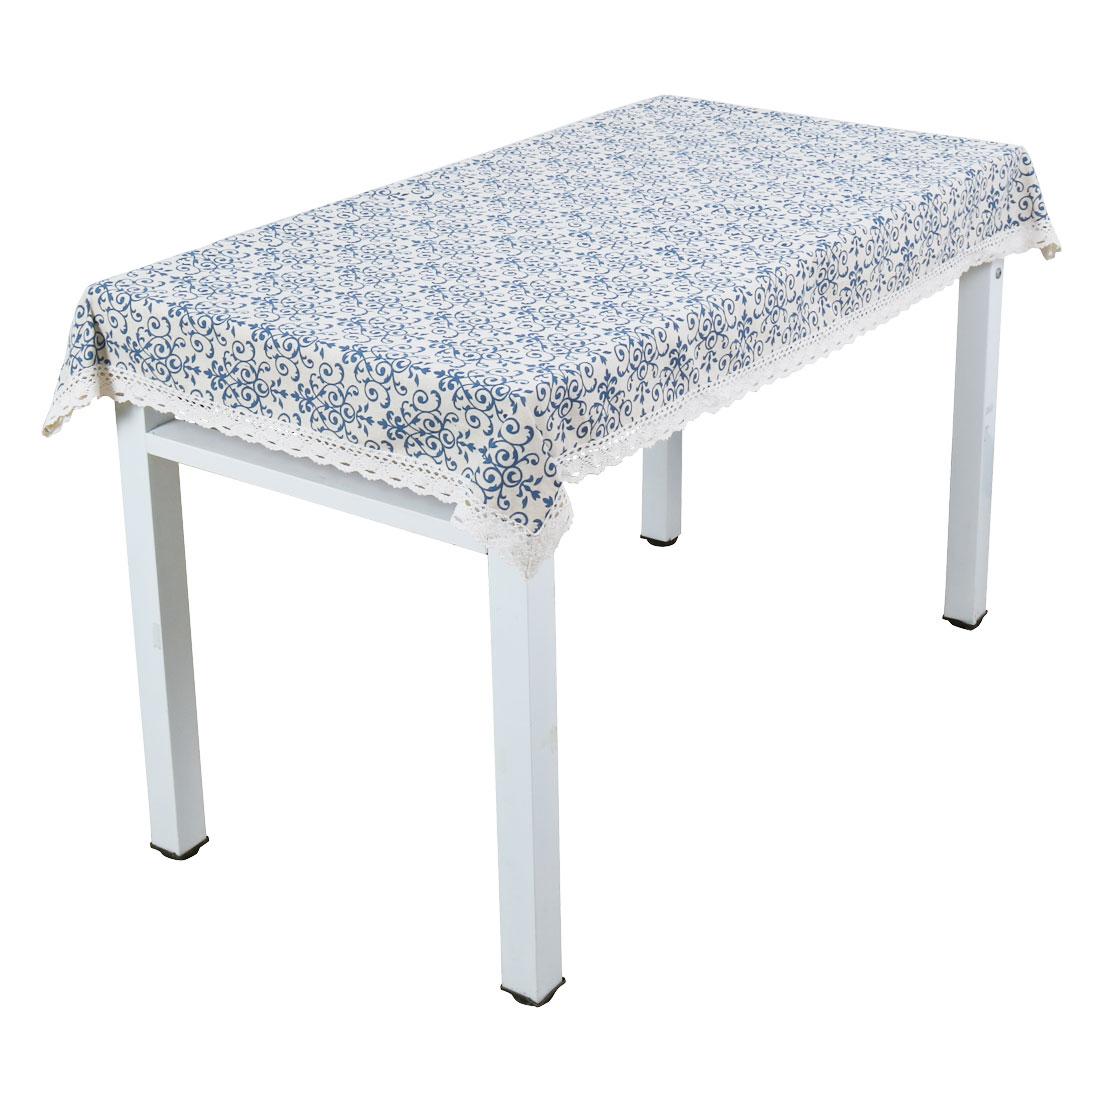 Vintage Navy Damask Pattern Lace Tablecloth Cotton Linen Table Cover 140 x 250cm